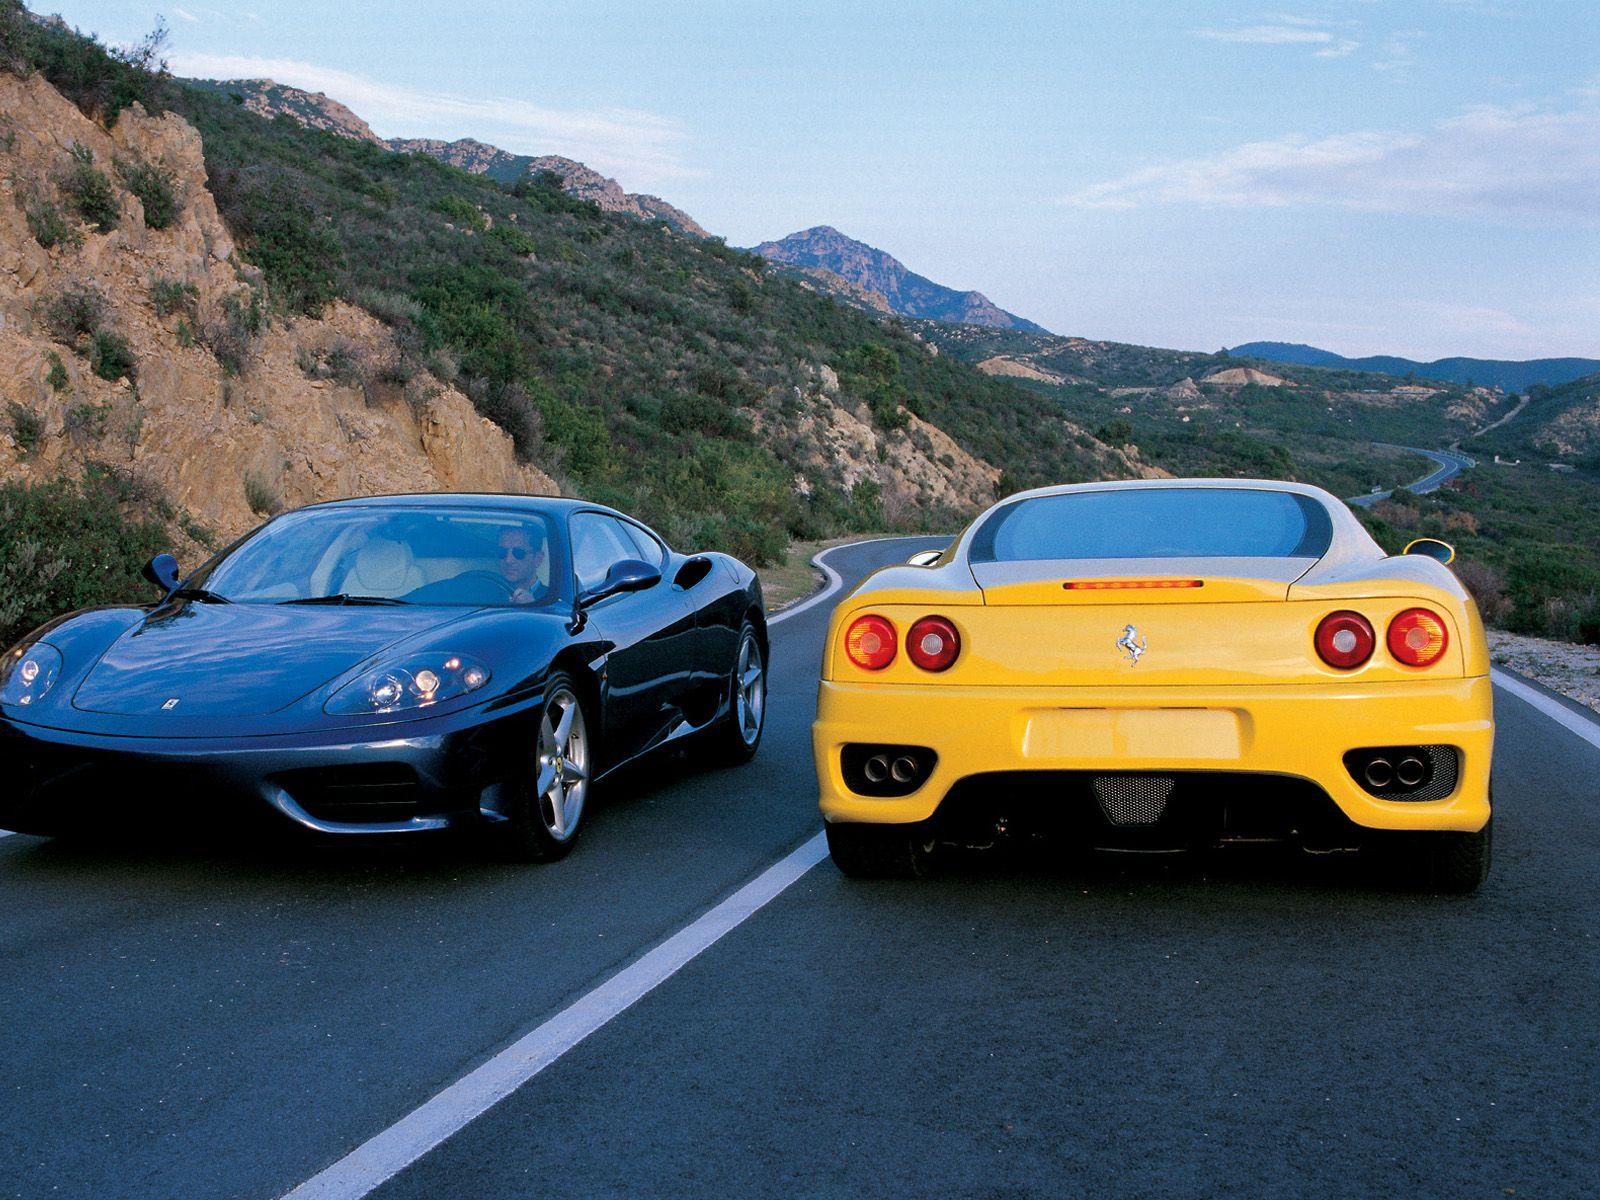 http://4.bp.blogspot.com/_uTGKd6u5pJ4/TRw1XSasy1I/AAAAAAAAAQo/DVcsD-e6MvY/s1600/Black-and-Yellow-Ferrari-360-Modena-Wallpaper.jpg